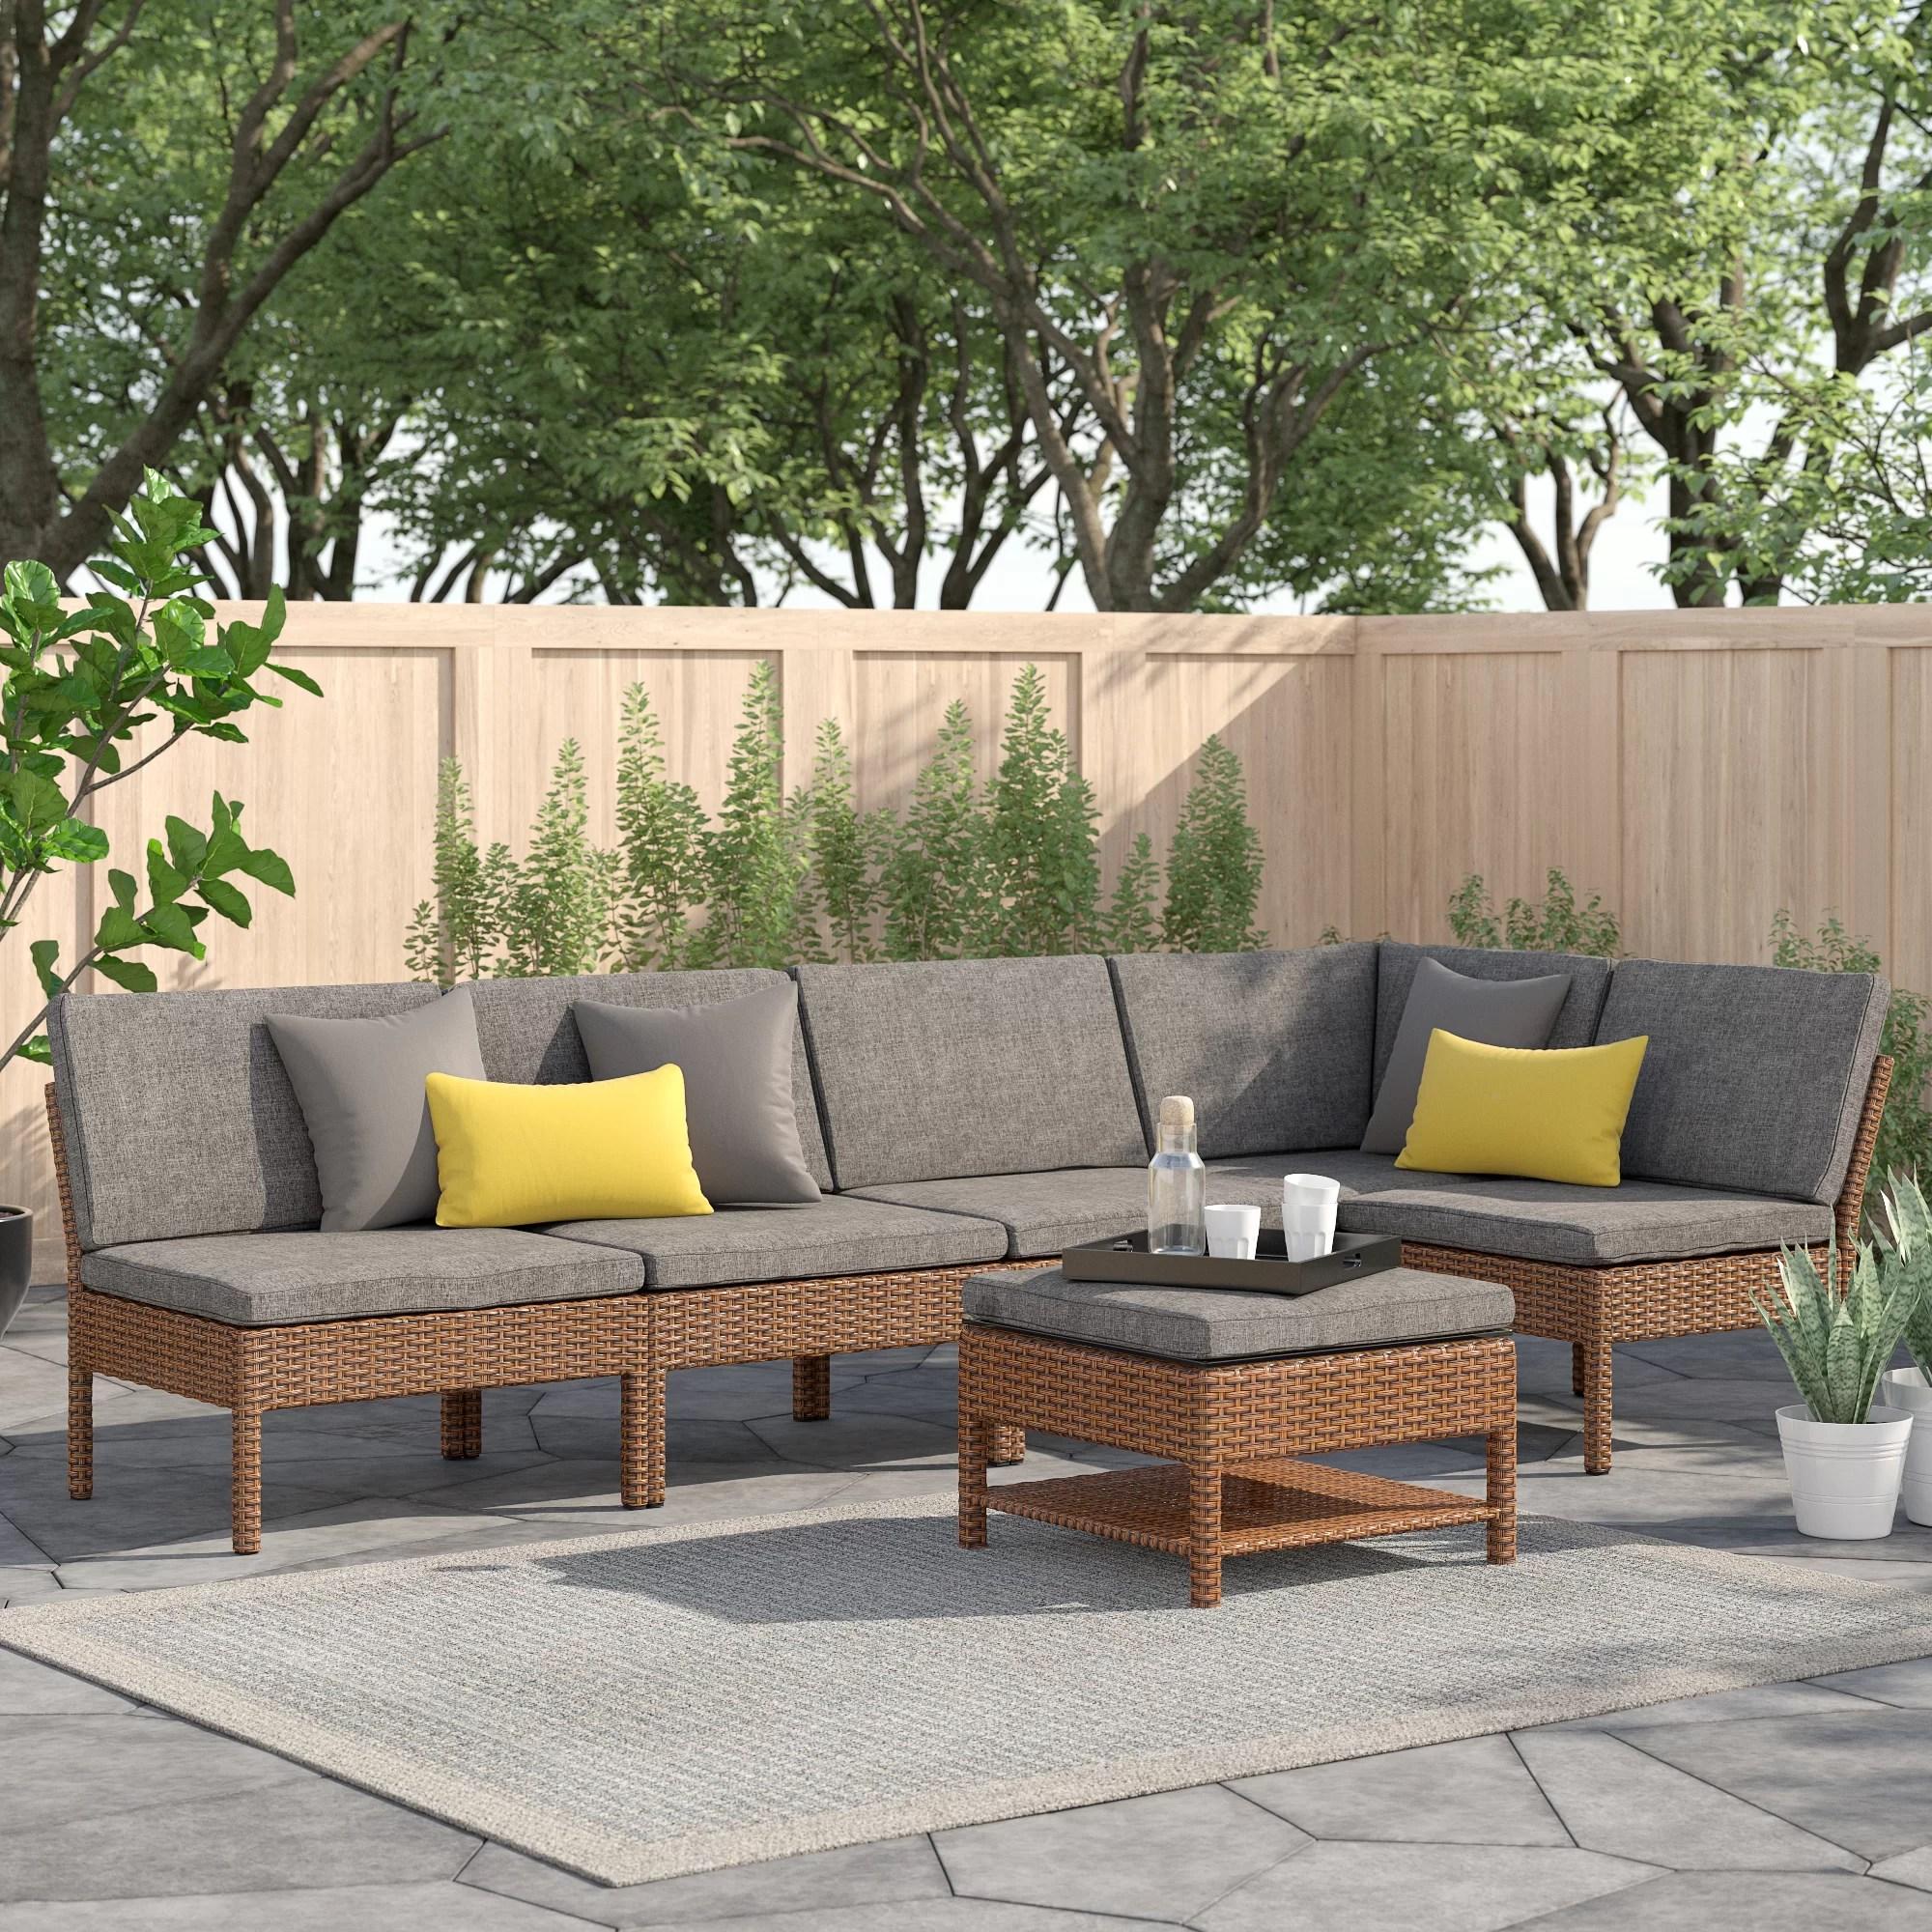 expanding wicker sectional sofa set